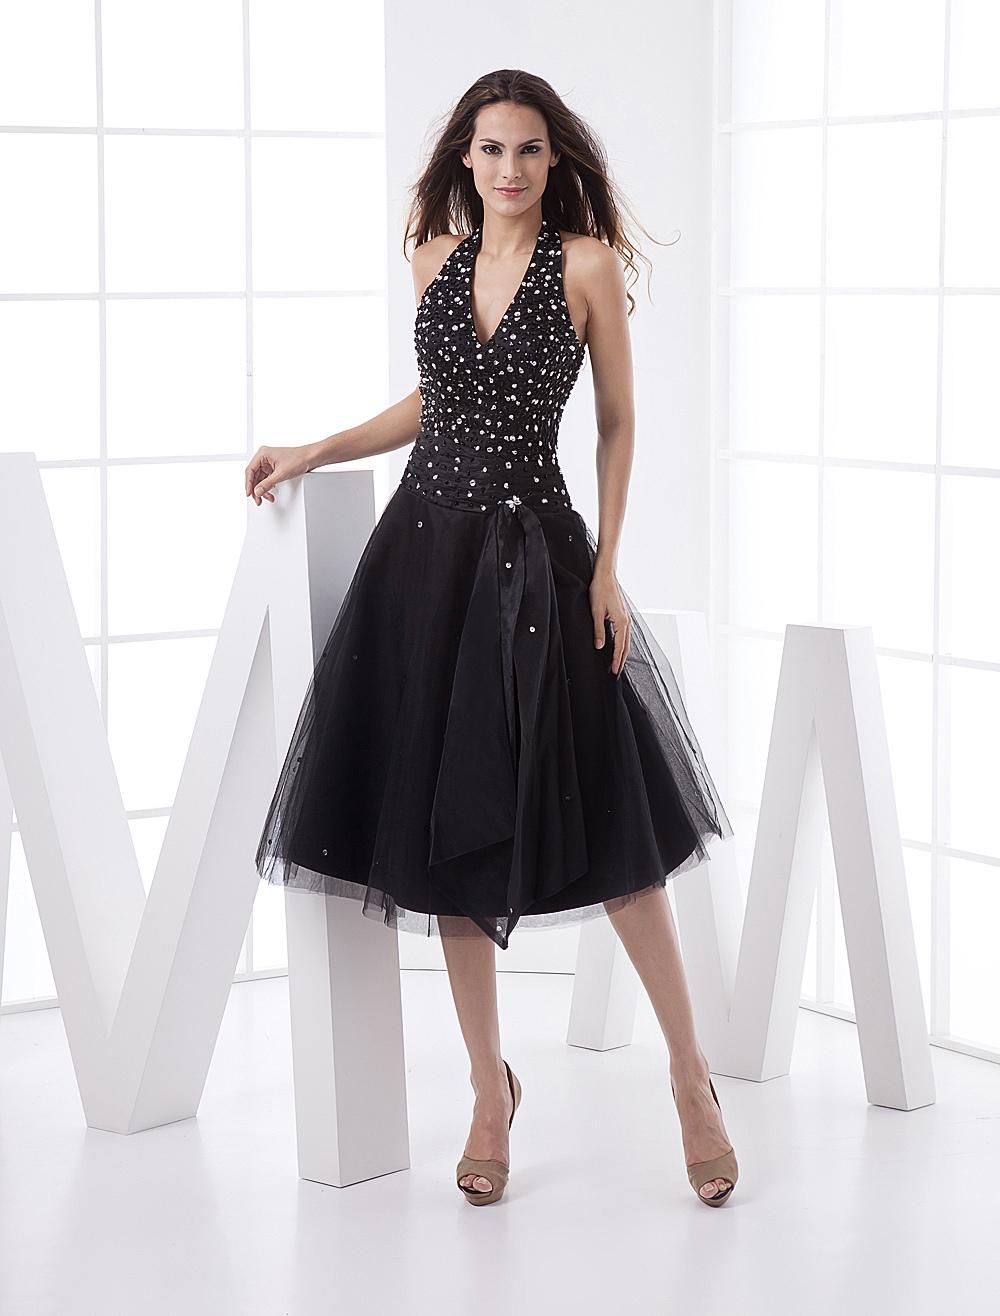 Black Deep-V Rhinestone Satin Prom Dress (Wedding Prom Dresses) photo